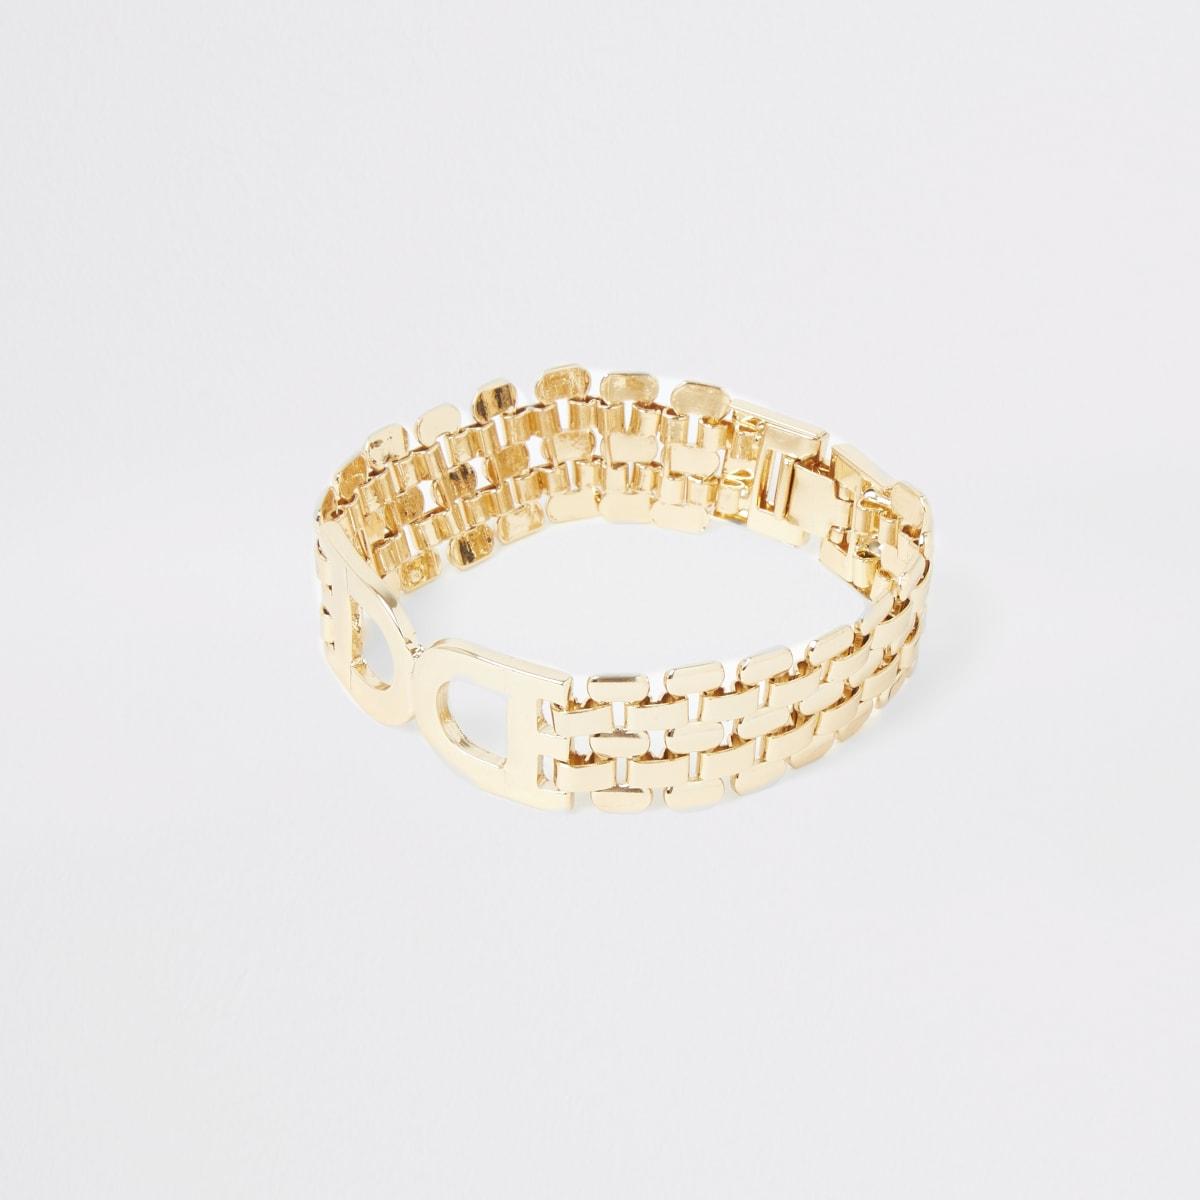 Gold color D ring chain bracelet